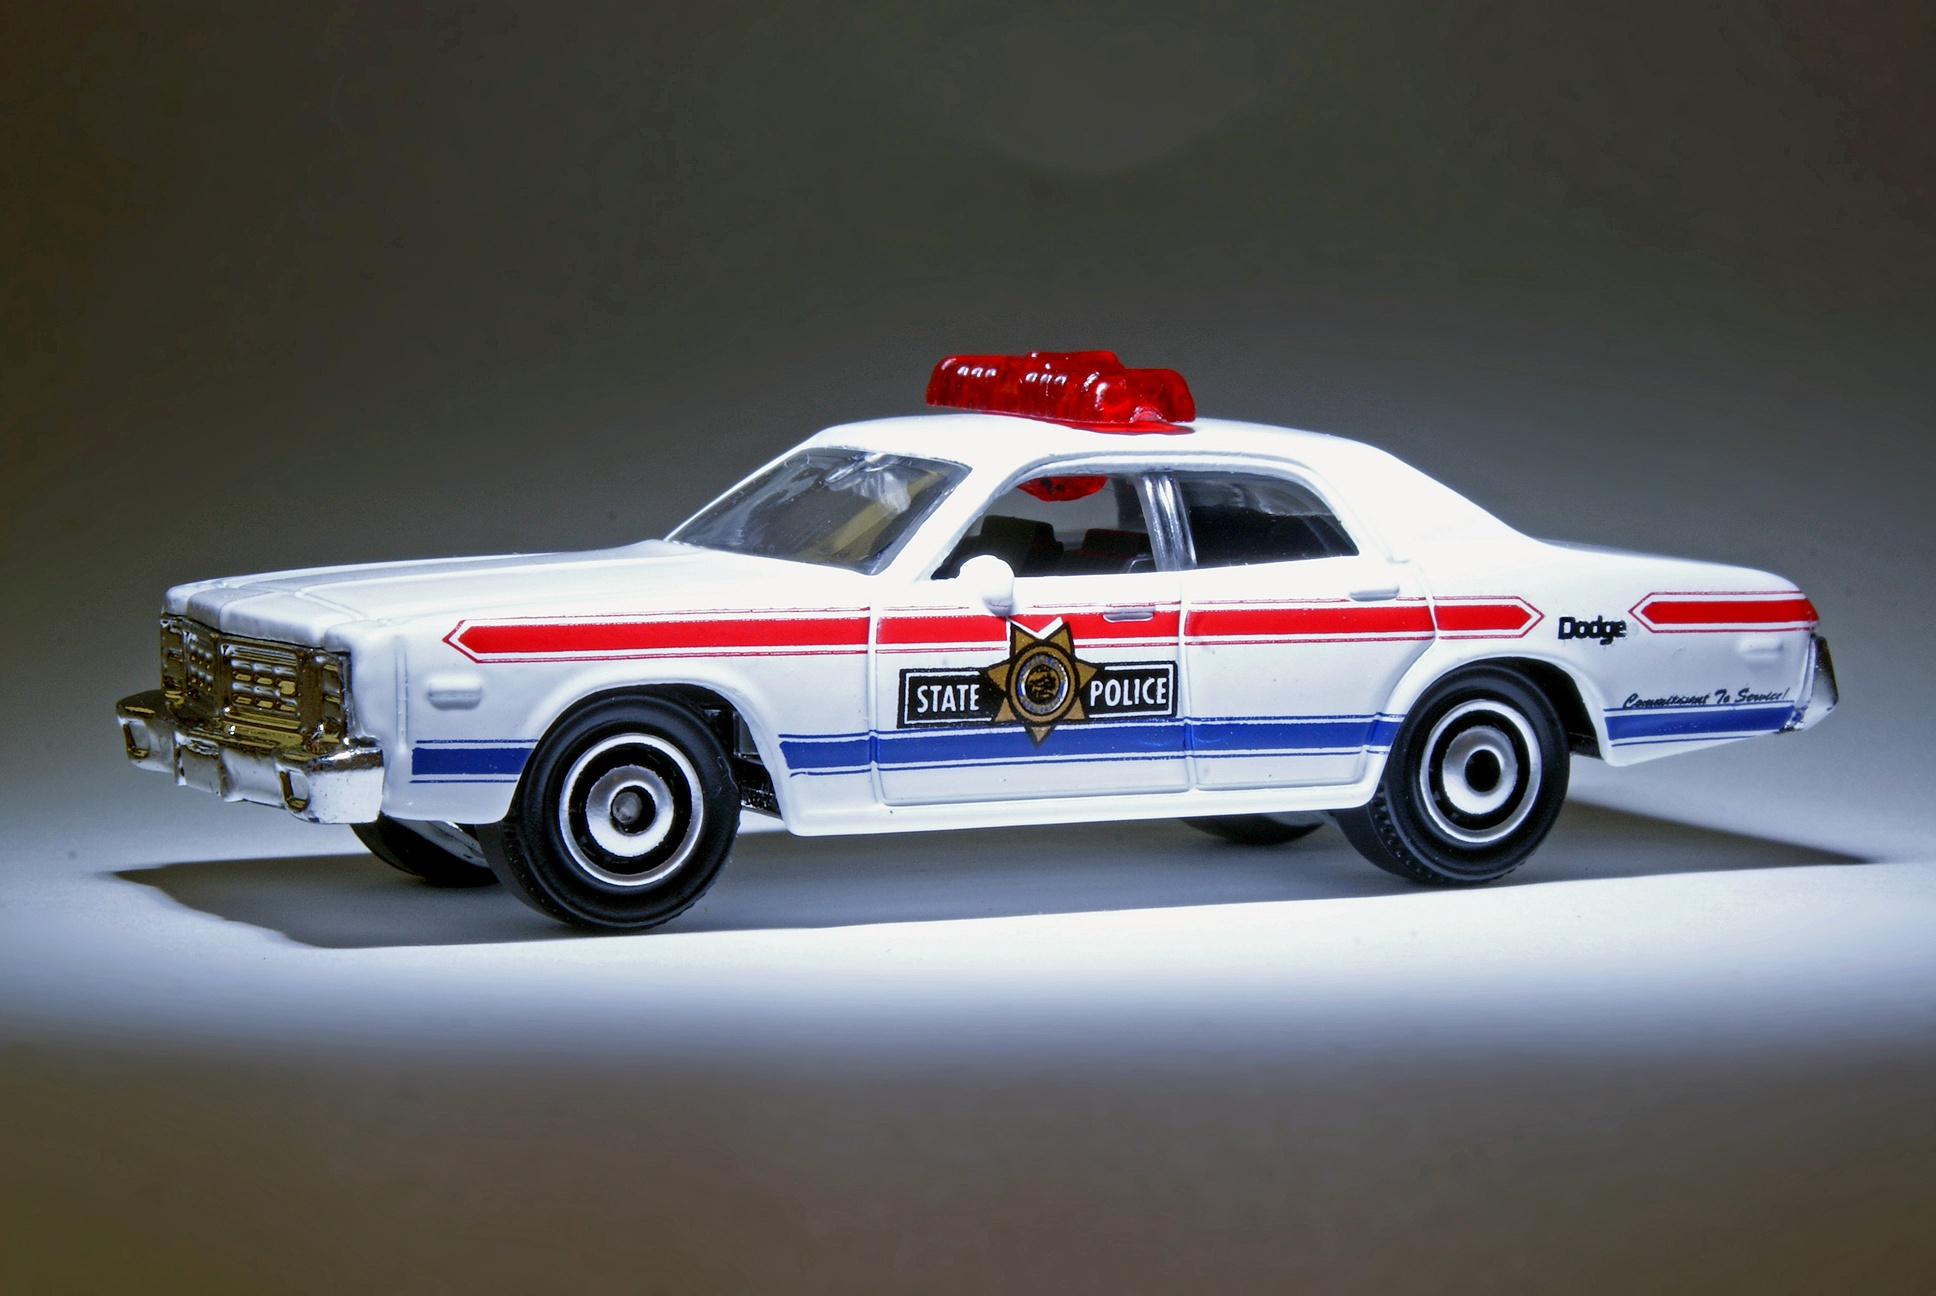 Police Car Matchbox Dodge Monaco Police Car 5-pack